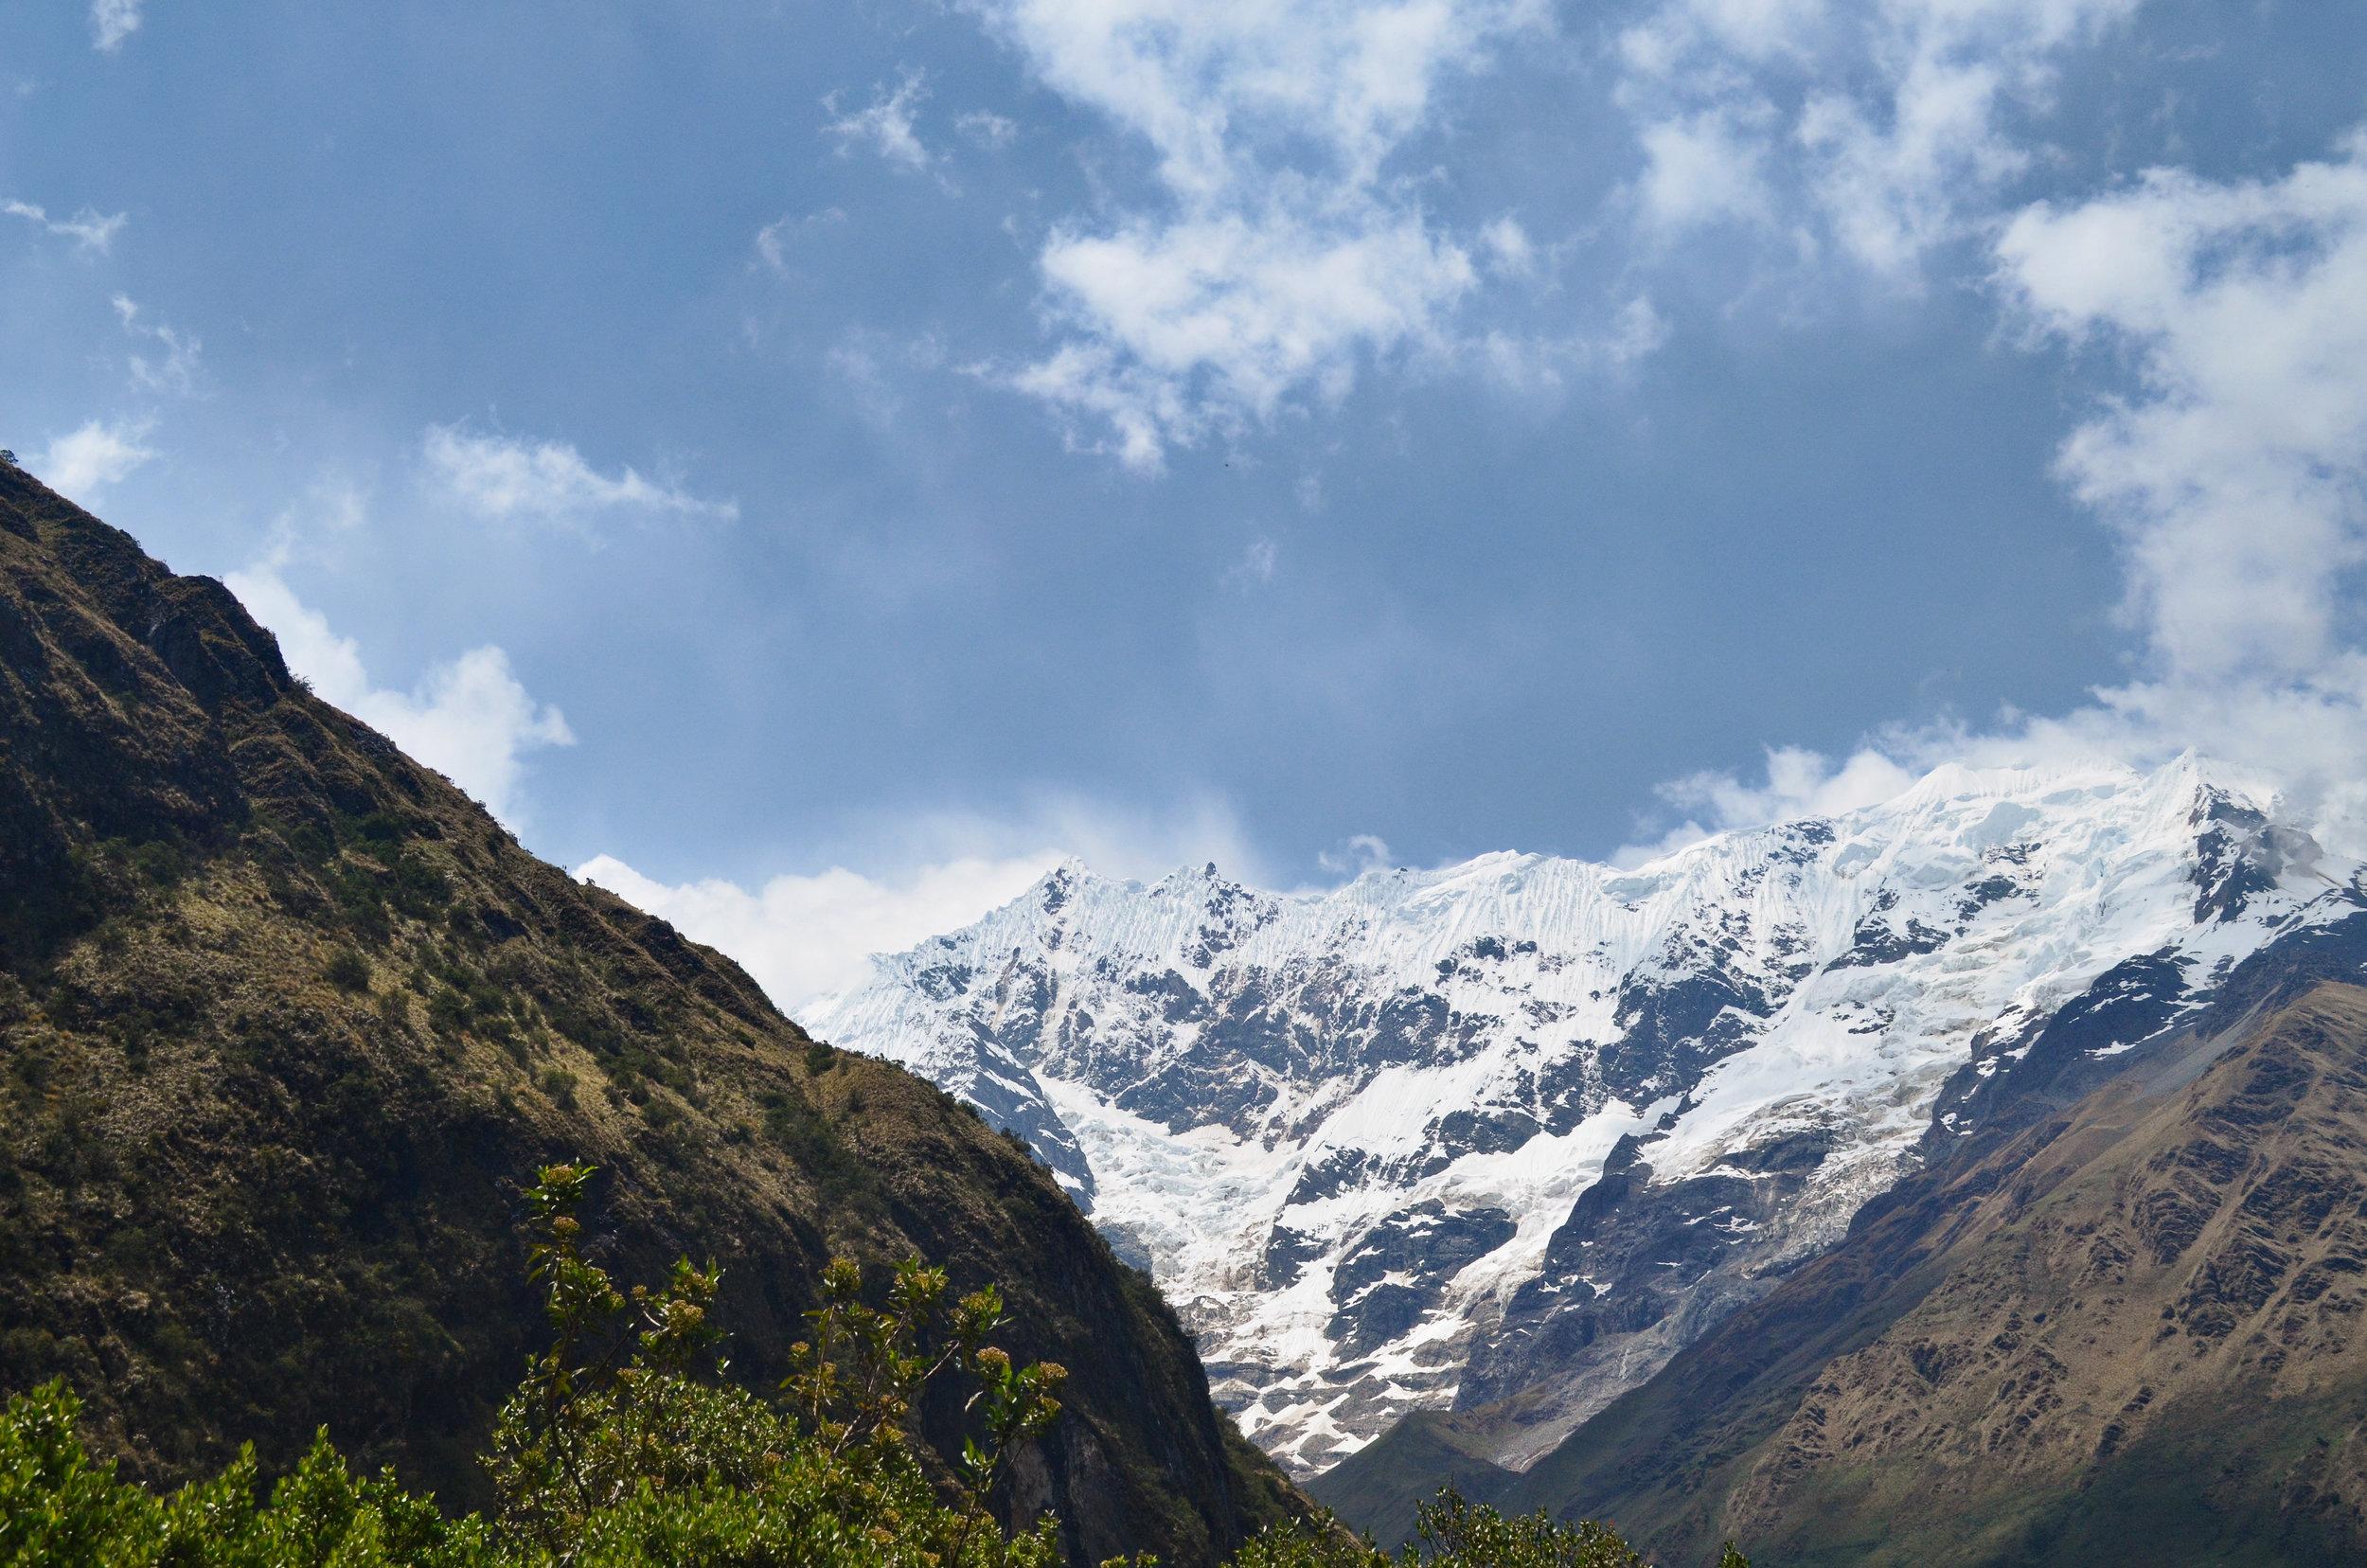 Epic views from the Salkantay trek